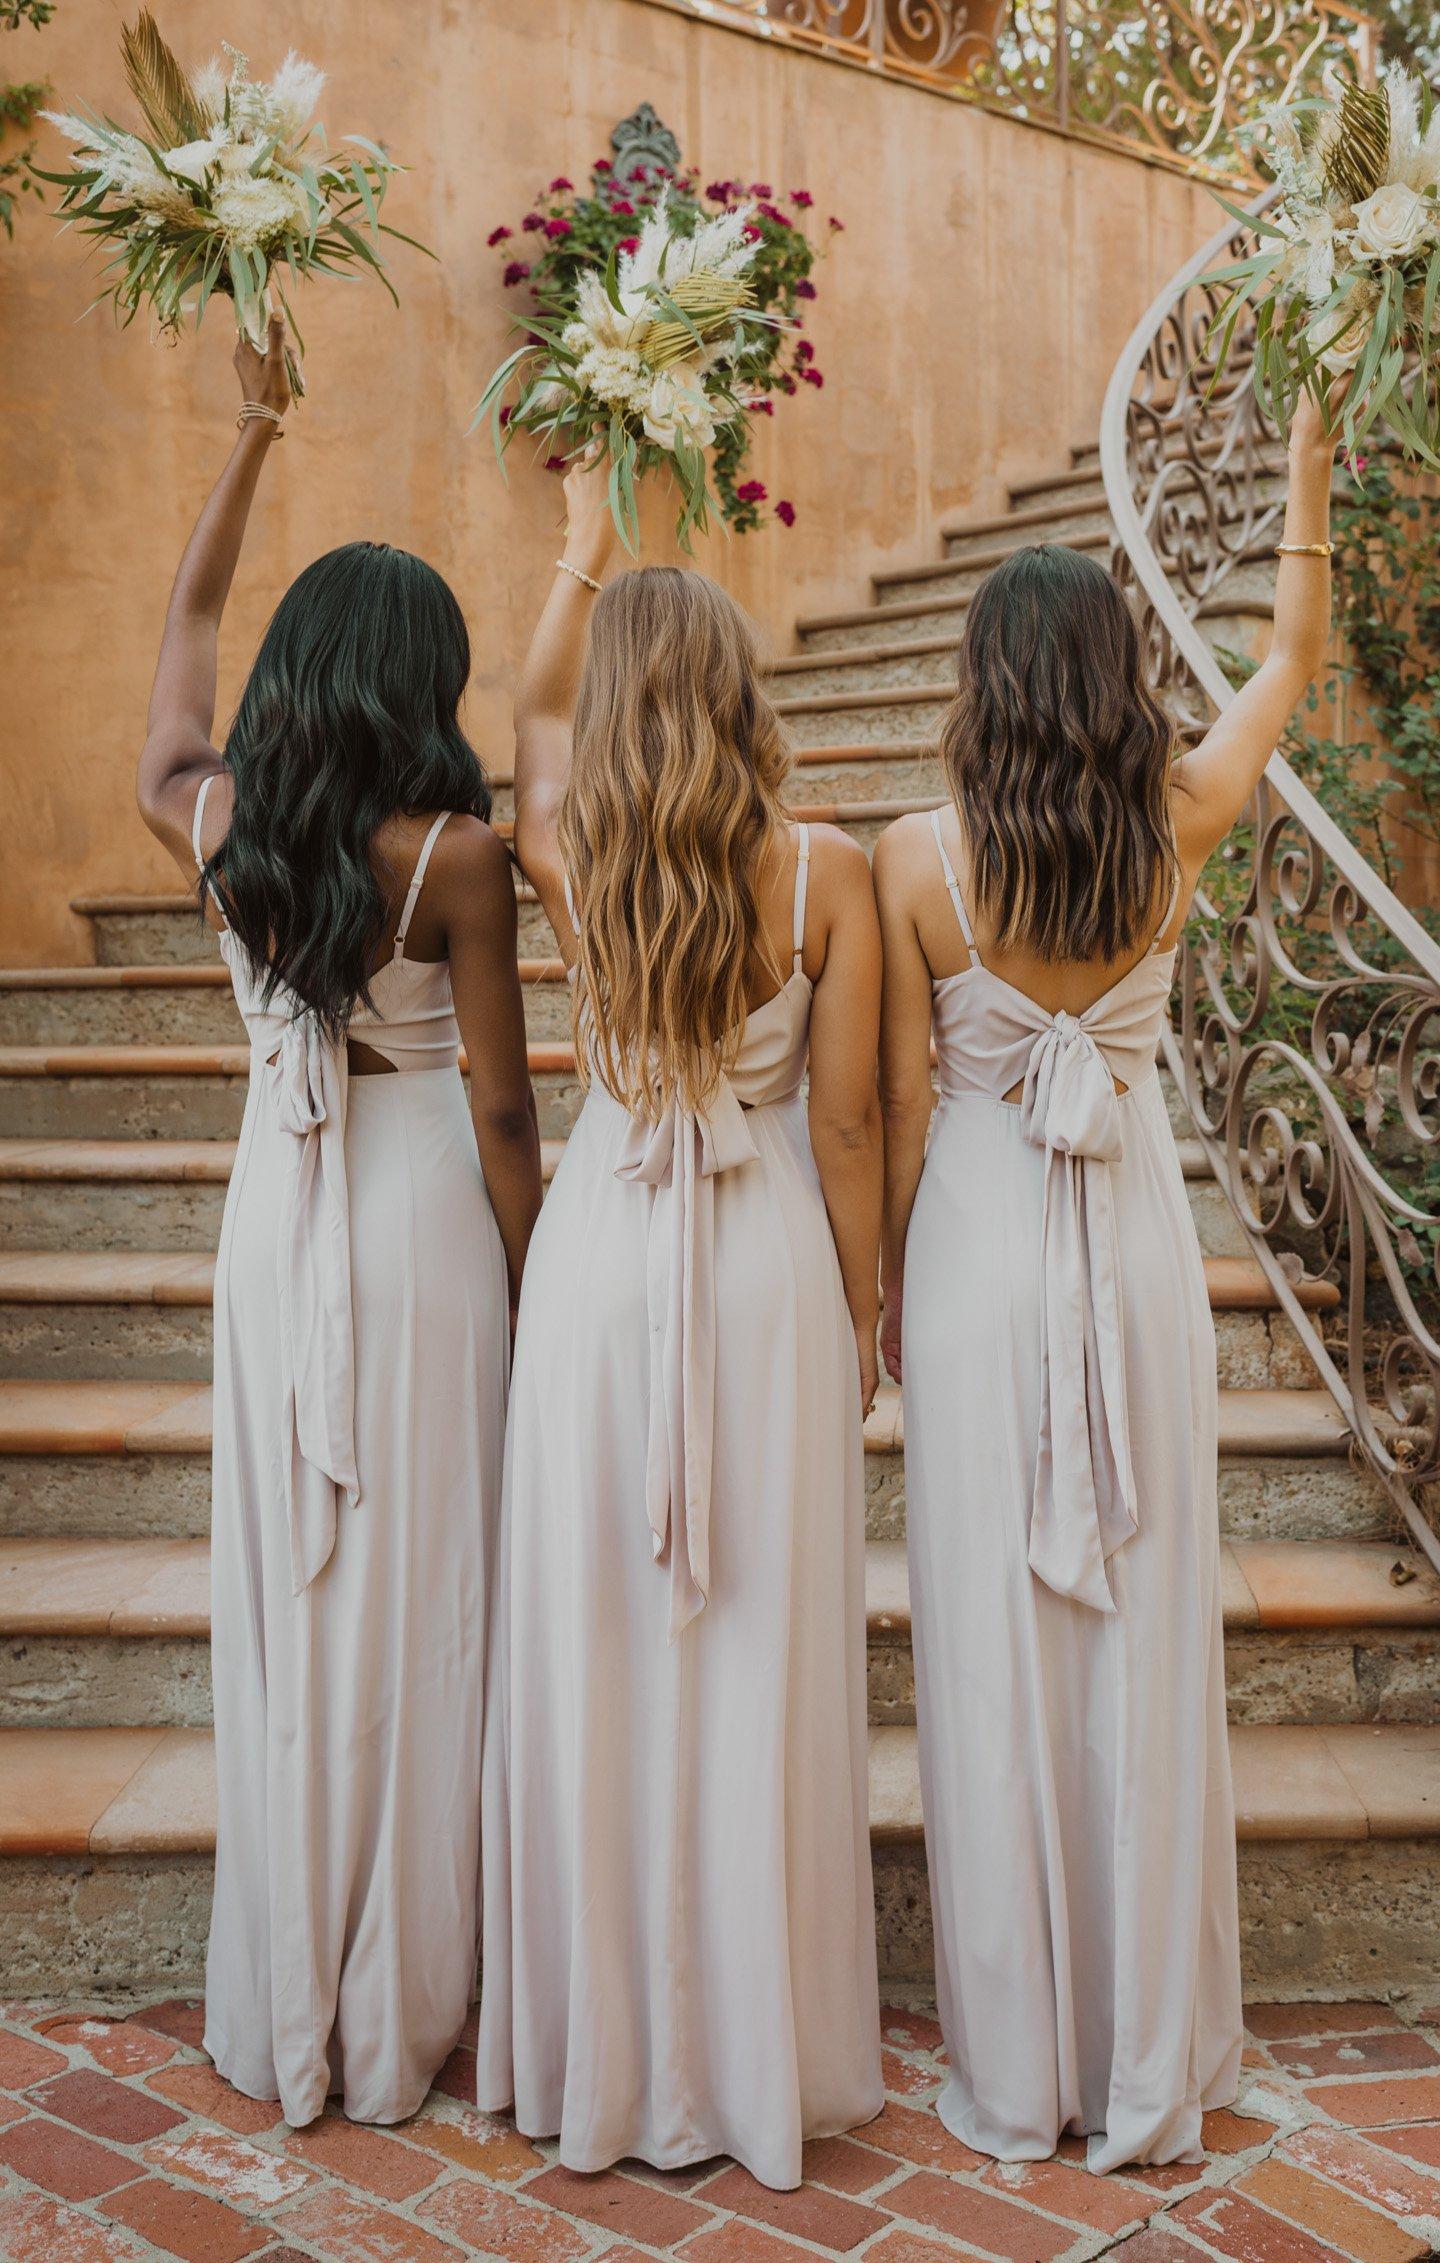 bridesmaid dresses, bridesmaid dress ideas, bridesmaid dress colors, bridesmaid dress styles, affordable bridesmaid dress, champagne bridesmaid dress, neutral bridesmaid dress, maxi bridesmaid dress